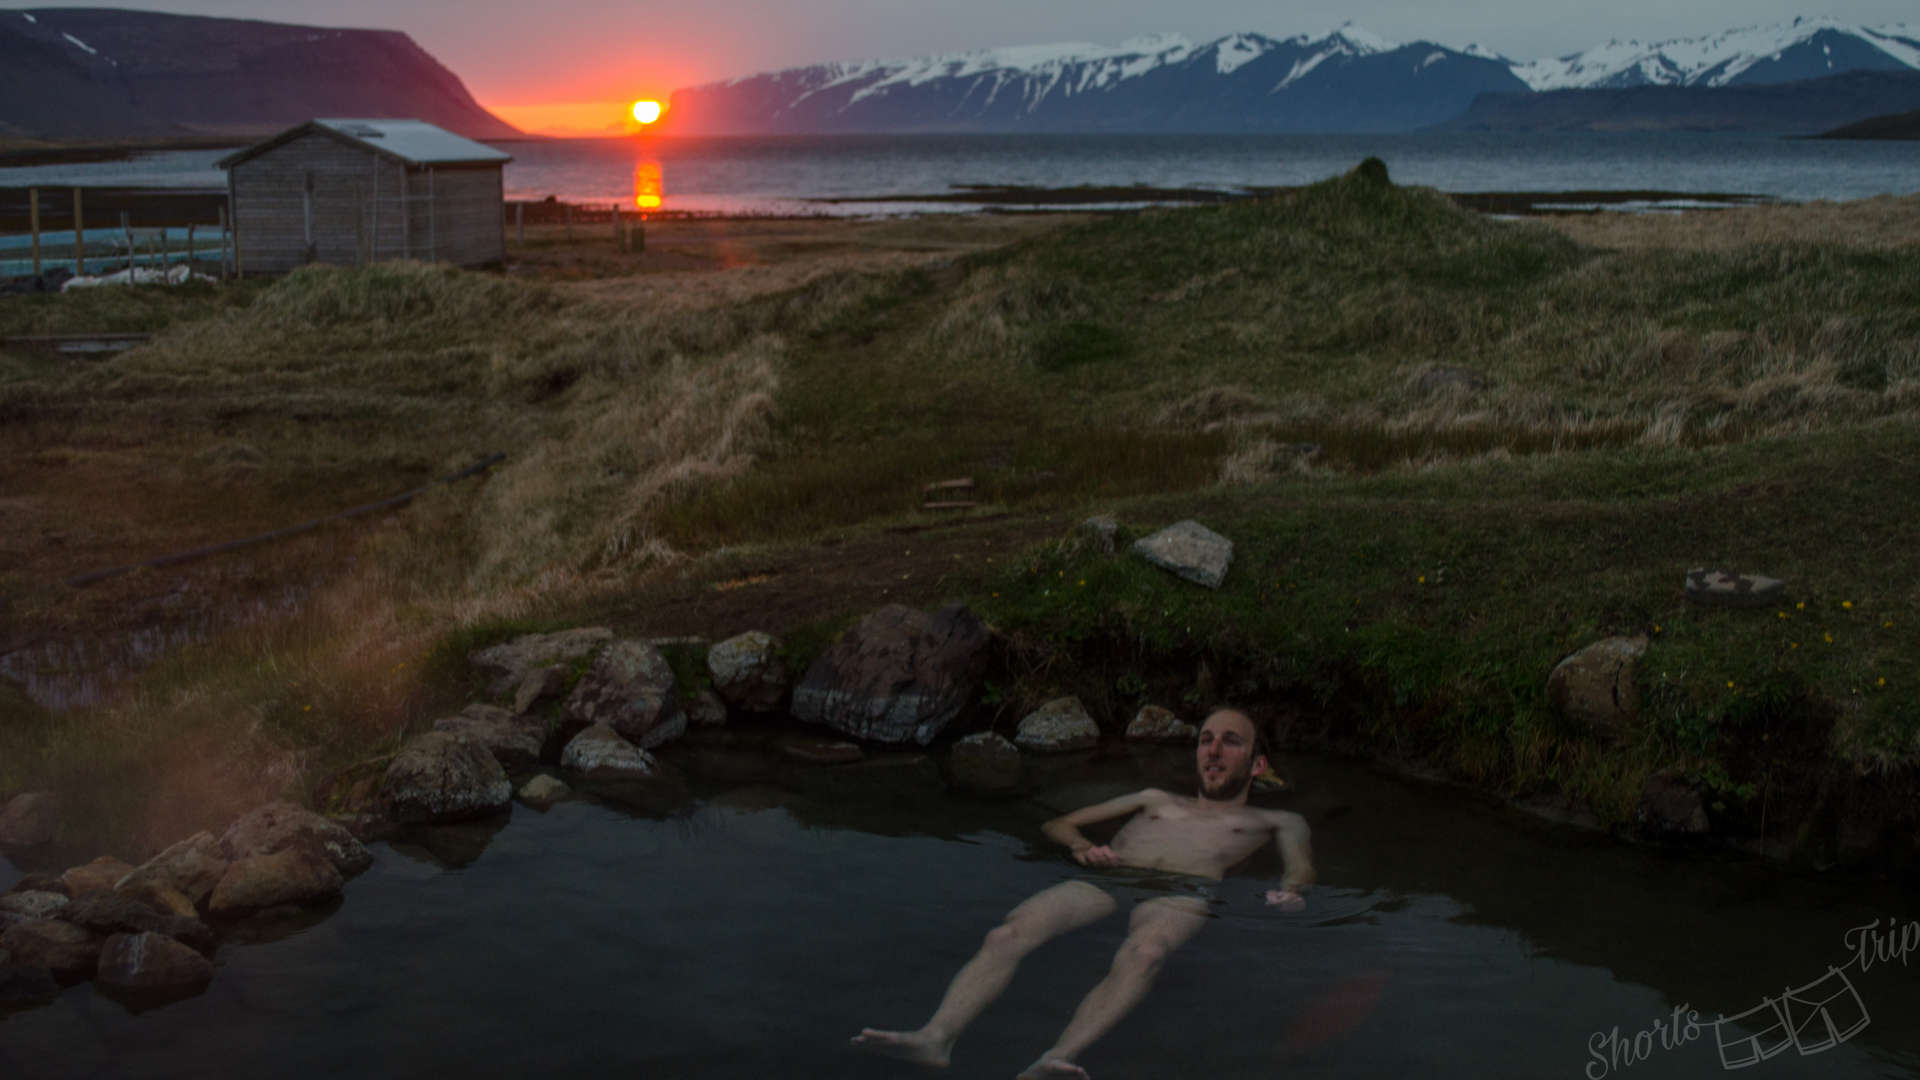 Reykjafjarðarlaug, Reykjafjarðarlaug sunset, camping around iceland